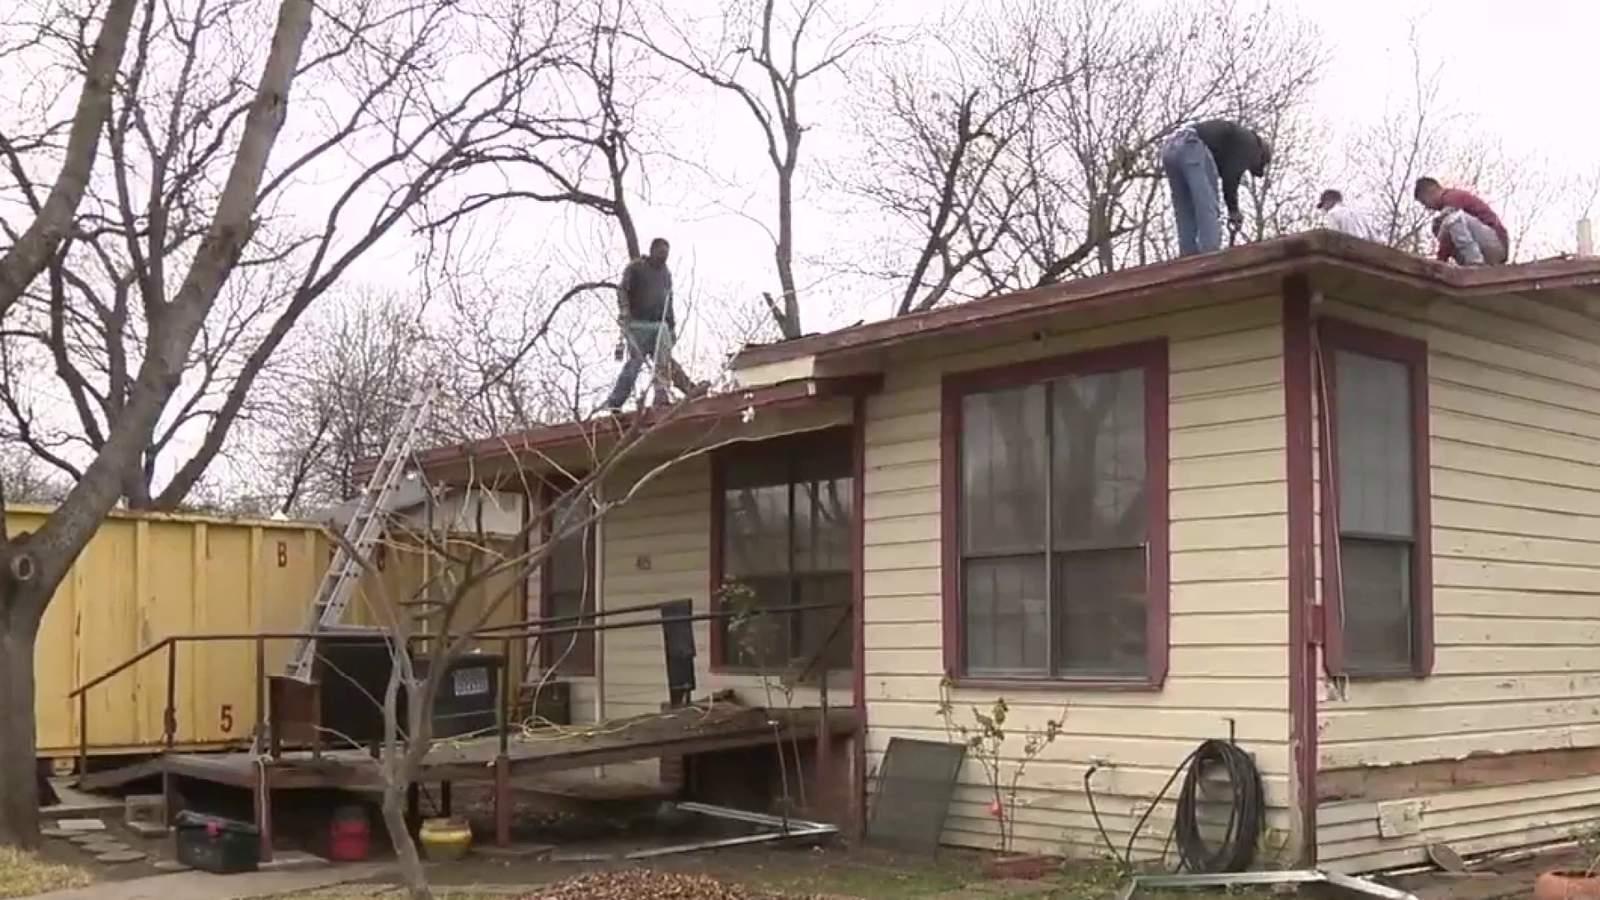 Work underway to restore home of 94-year-old war hero